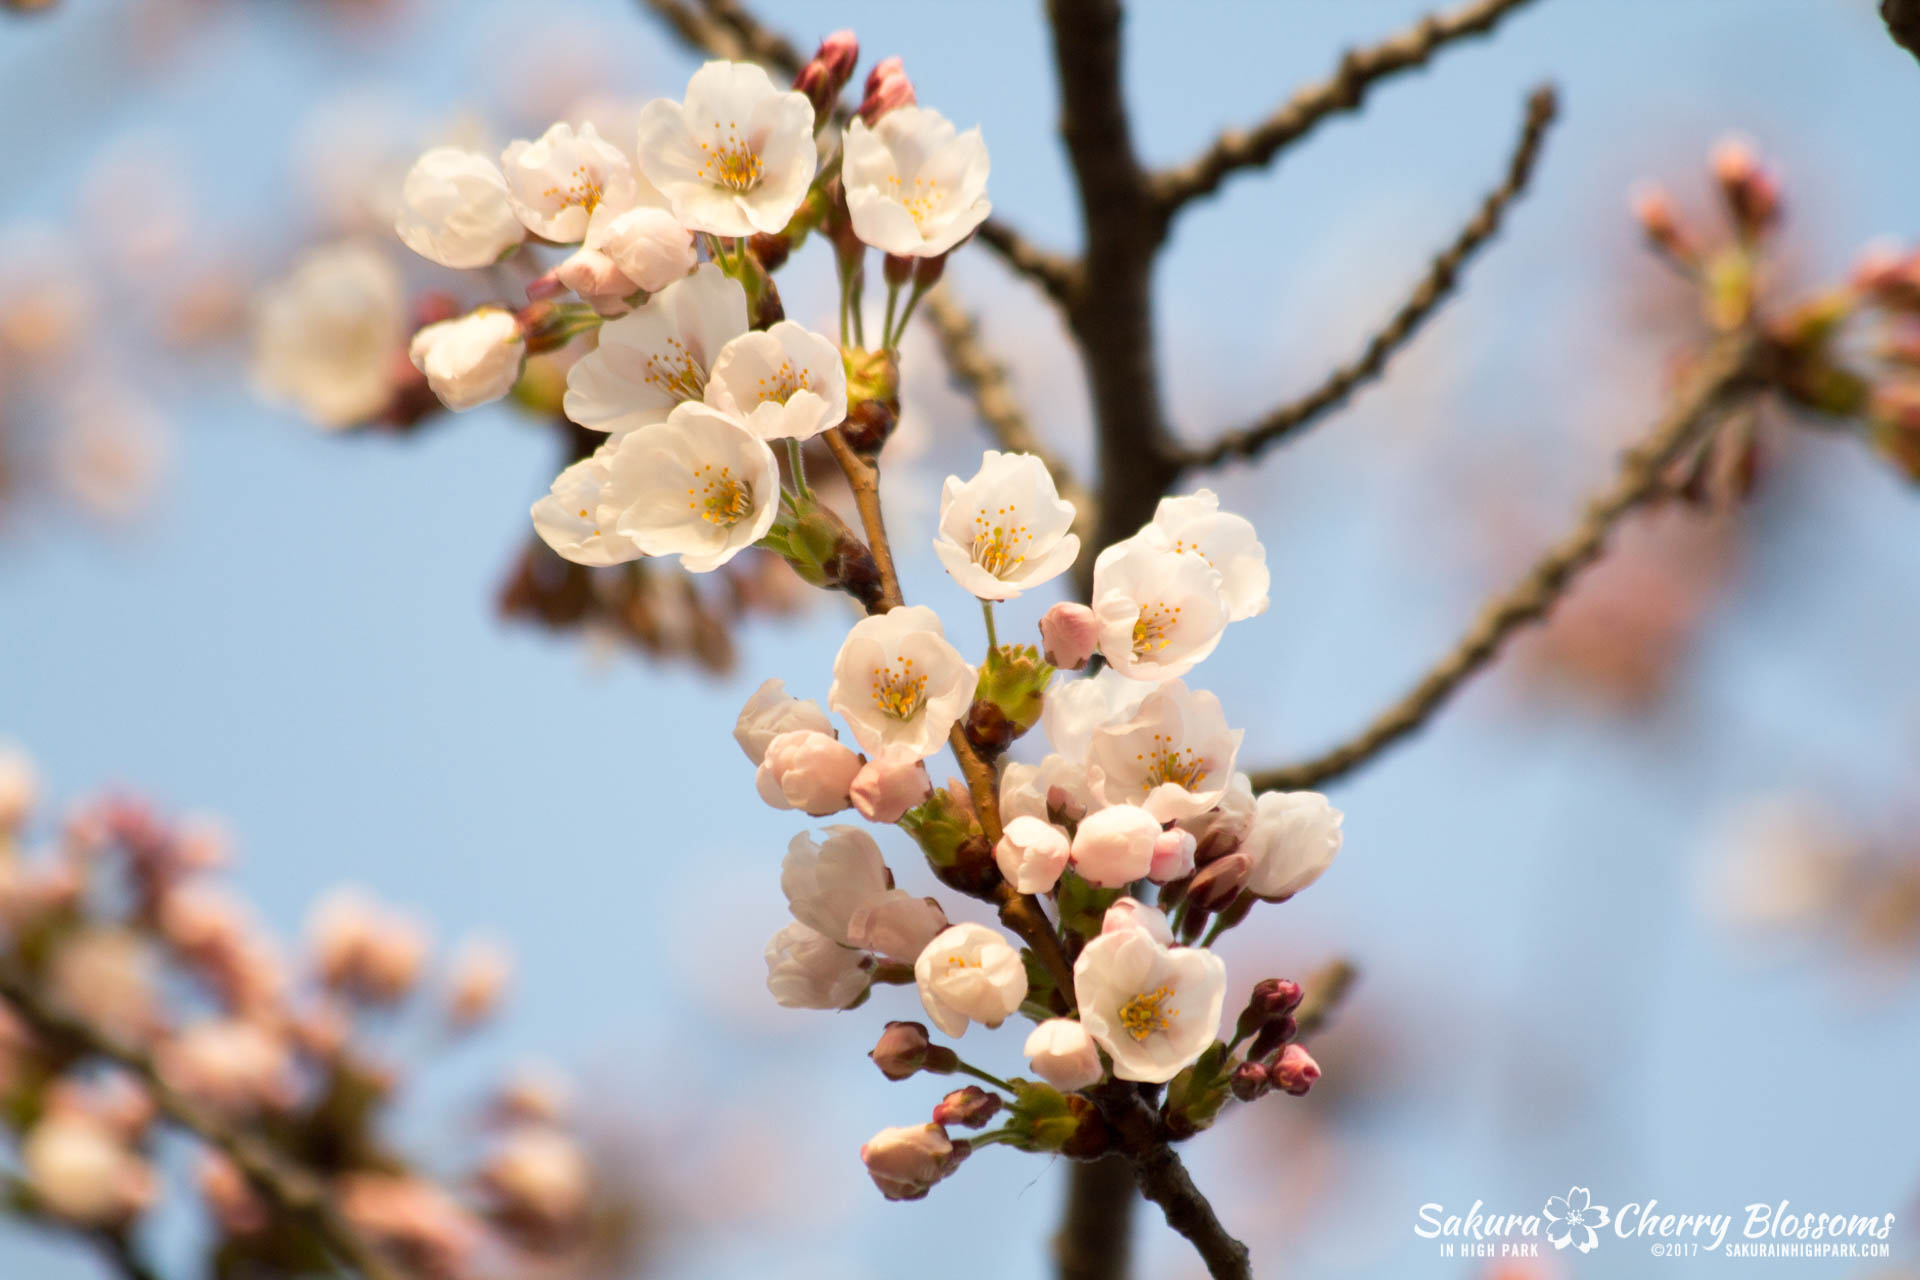 Sakura-Watch-April-24-2017-bloom-has-begun-with-more-to-come-64.jpg